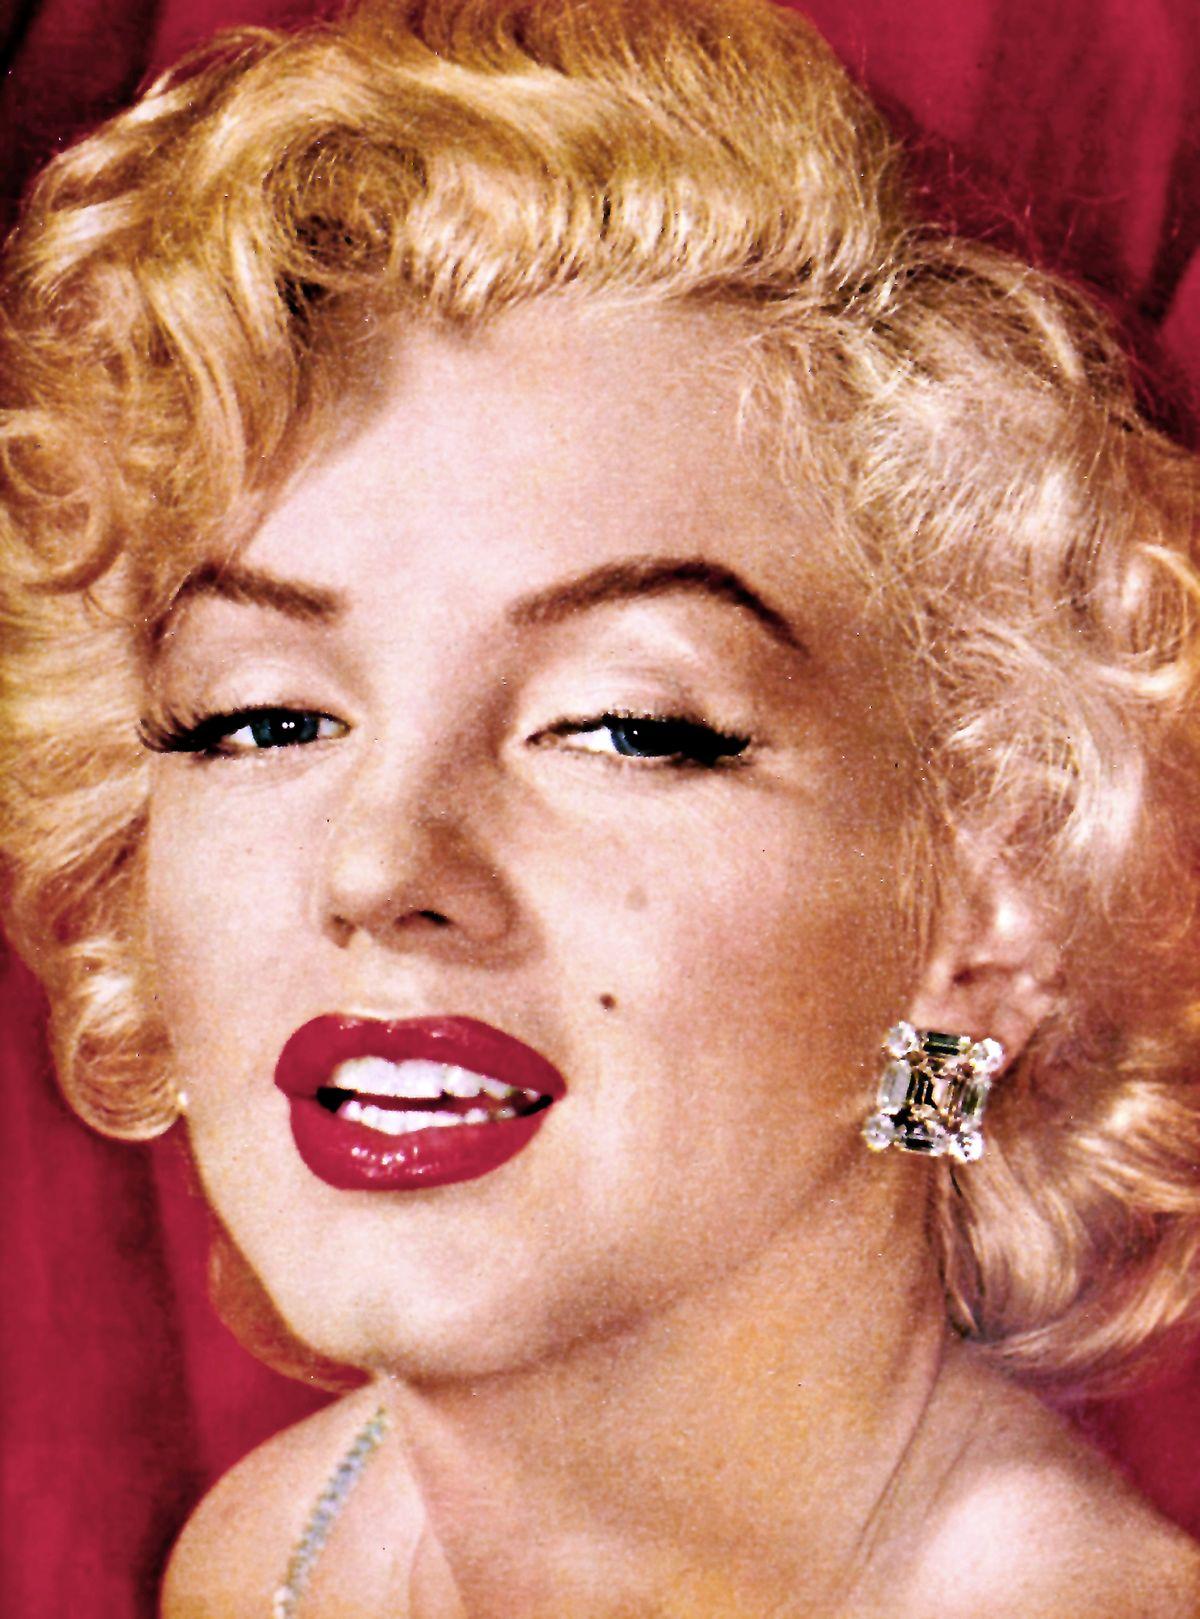 Citaten Marilyn Monroe Movie : مریلین مونرو ویکیپدیا، دانشنامهٔ آزاد